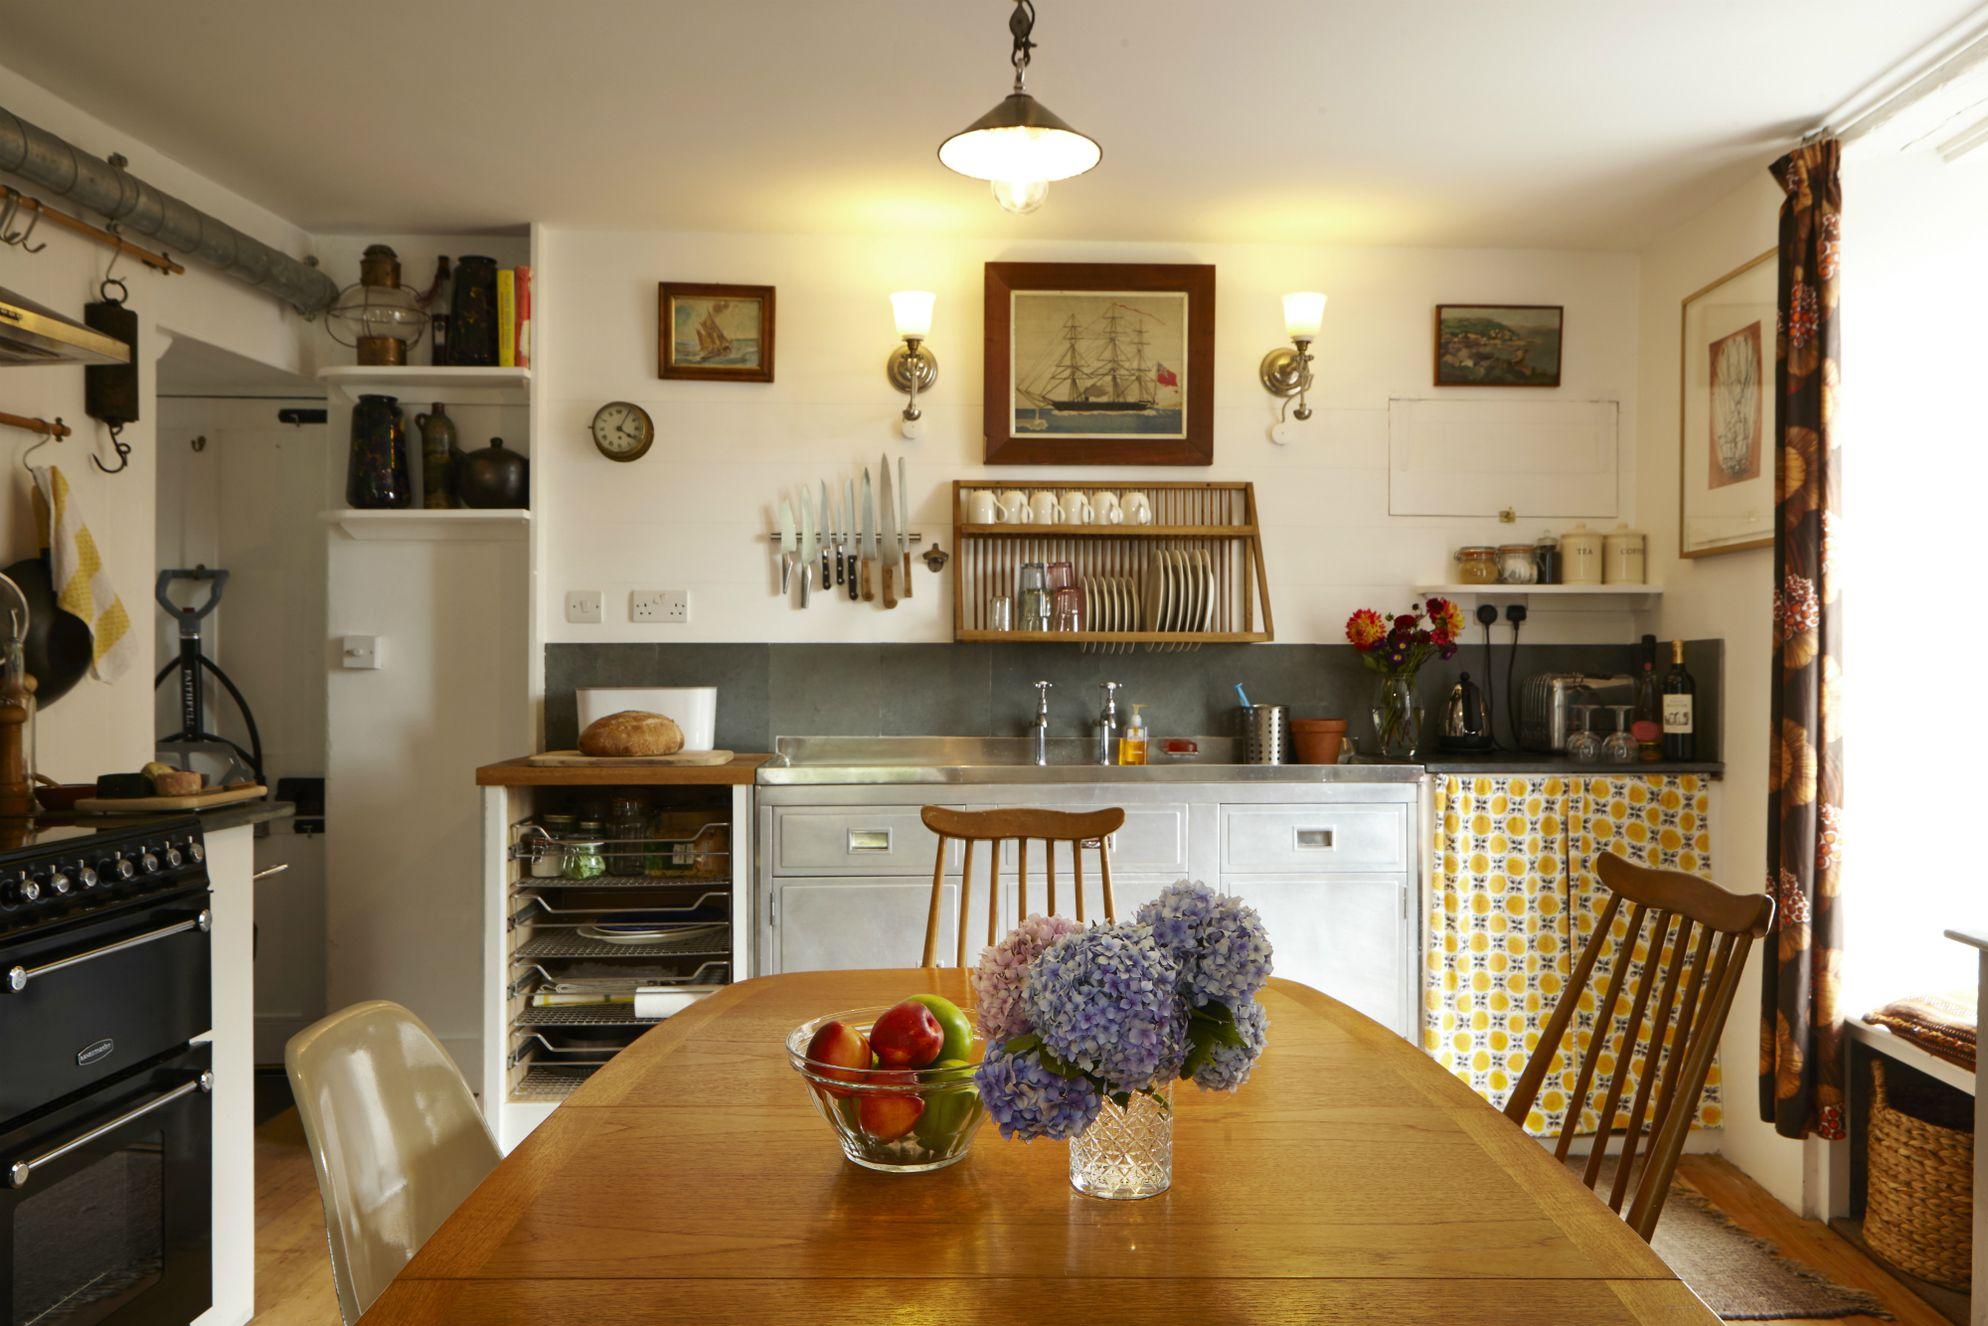 Janie's Cottage - Gallery